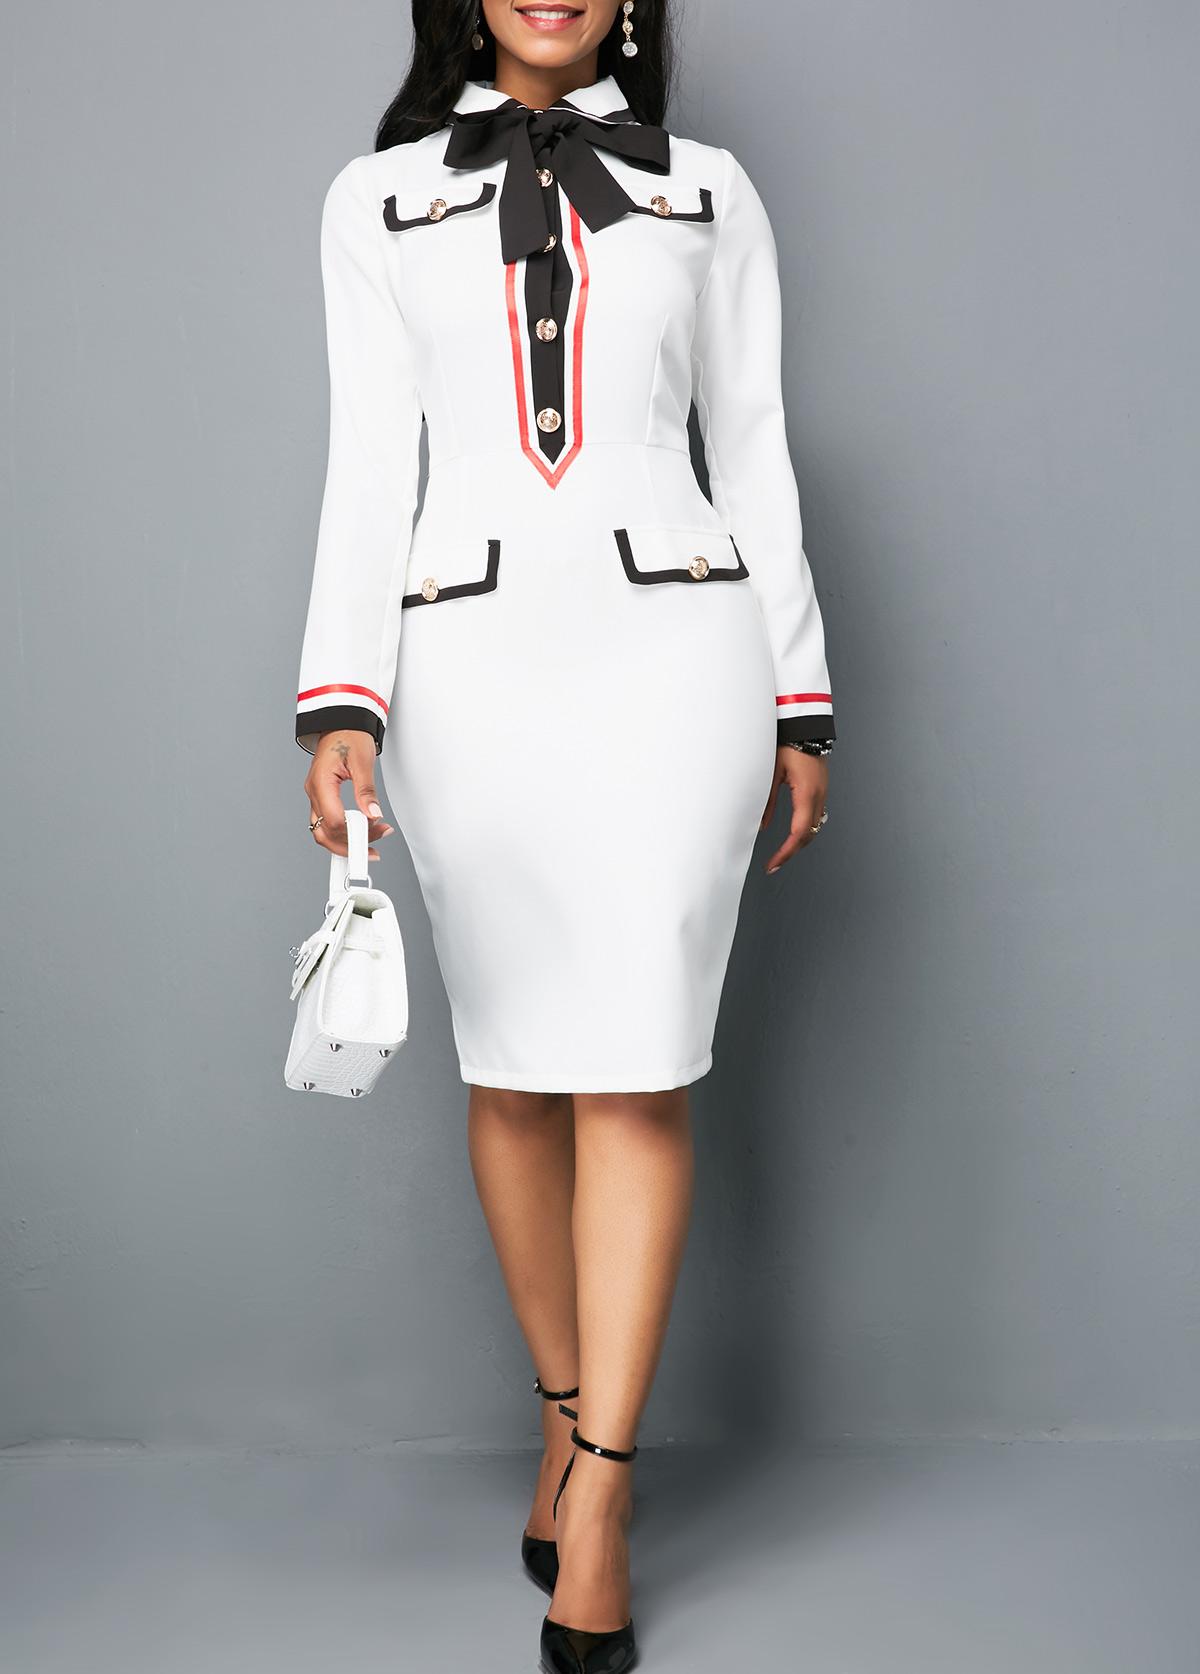 Long Sleeve Button Front White Sheath Dress